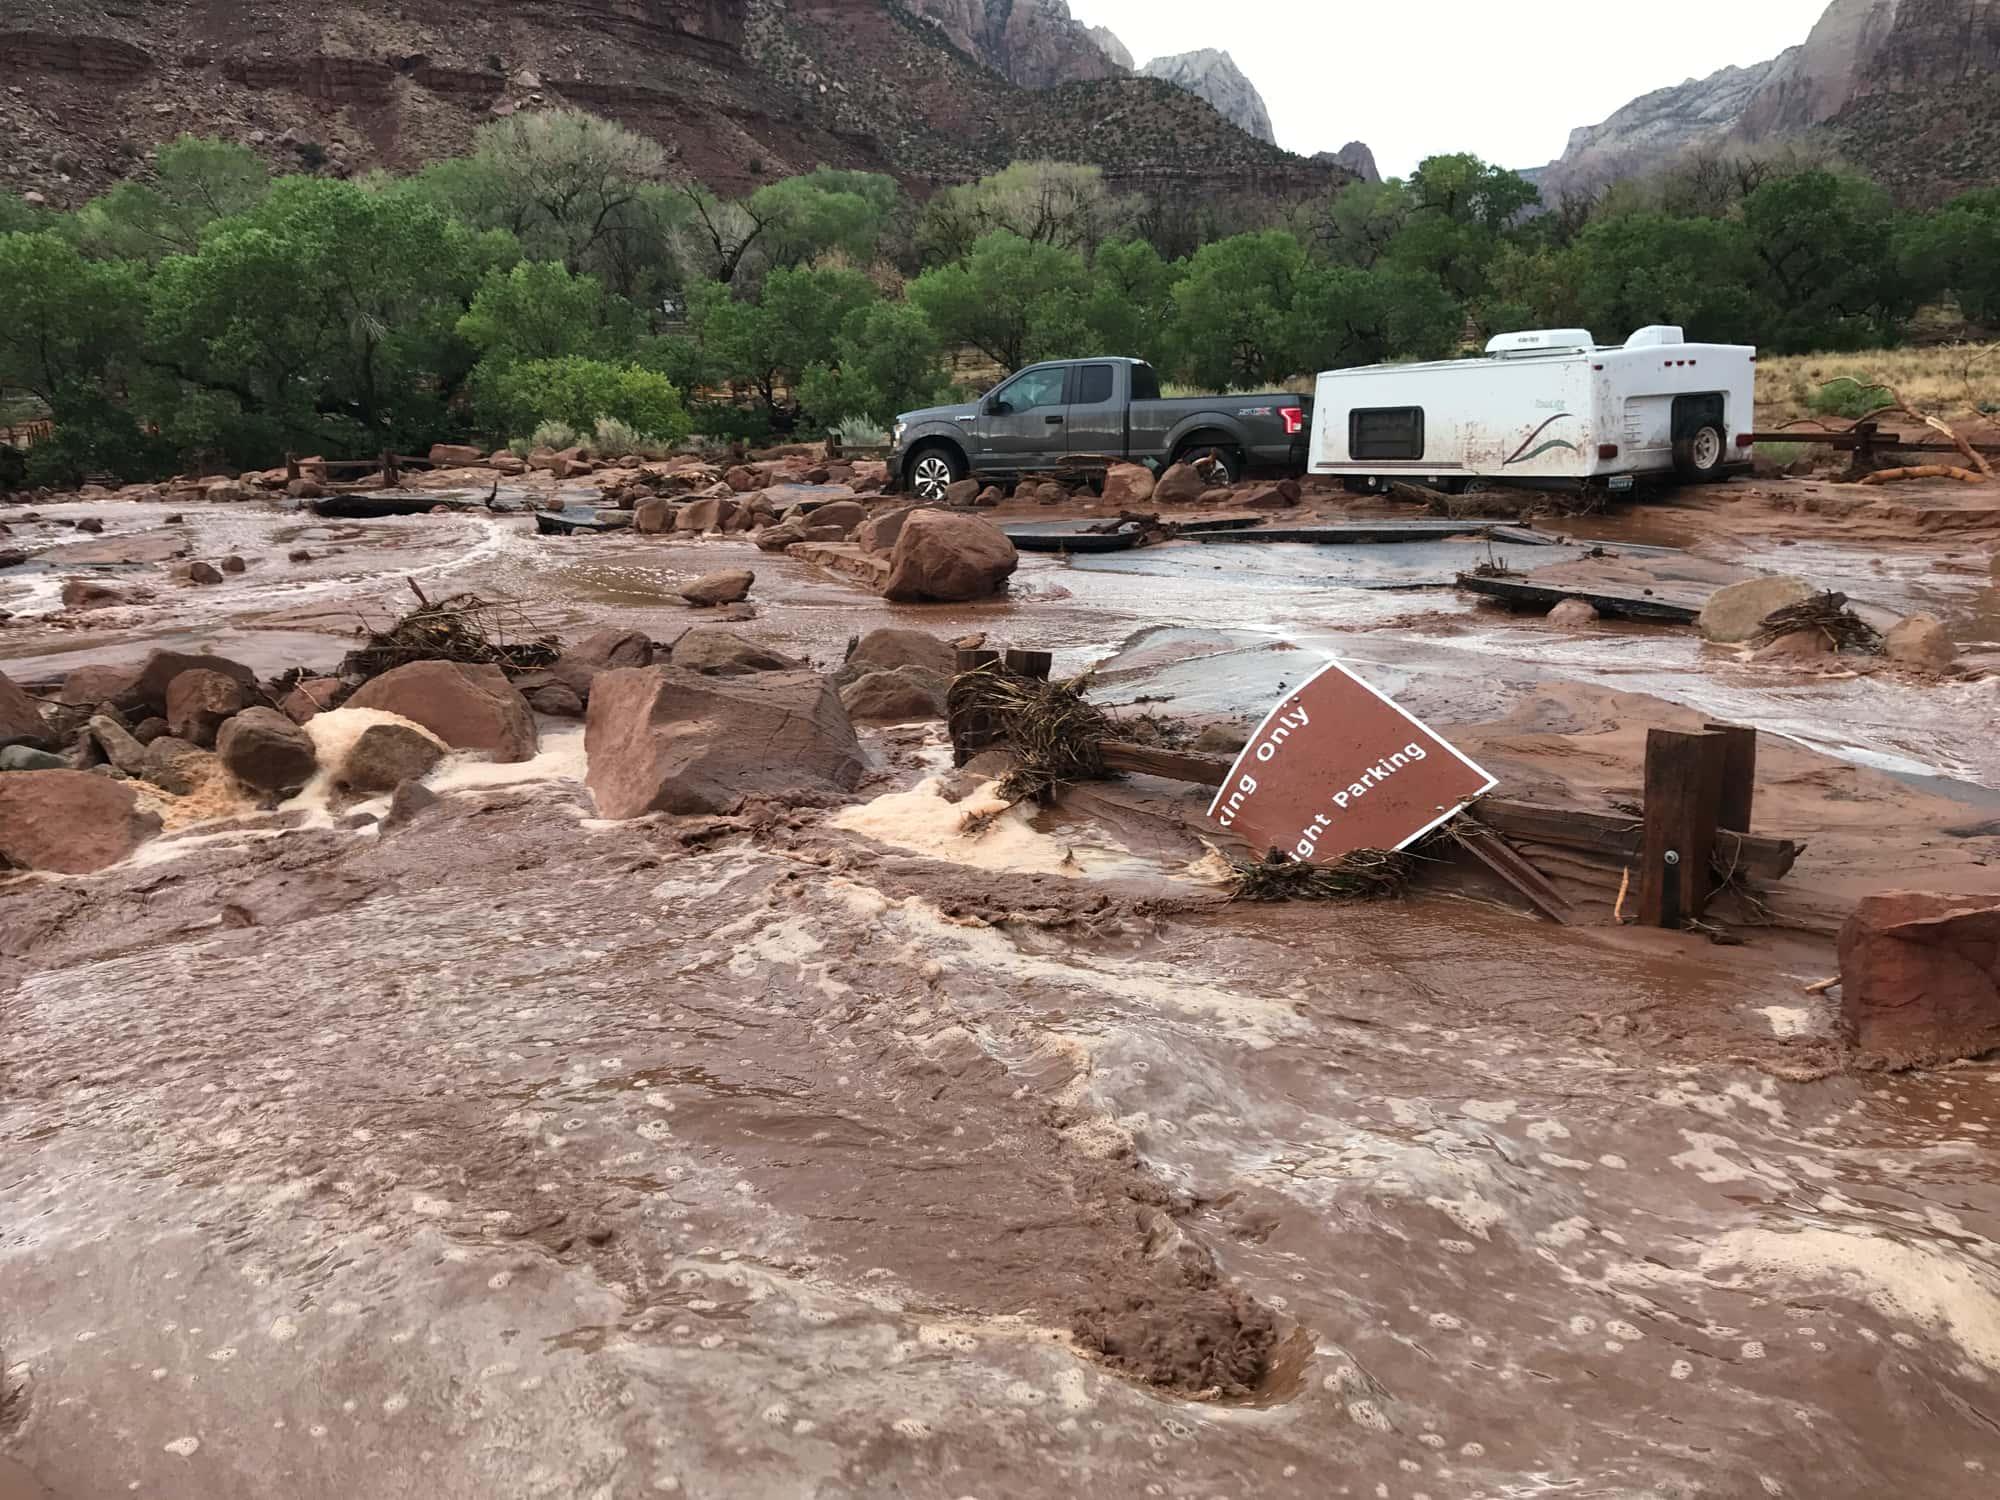 Zion national park, utah, flash flood